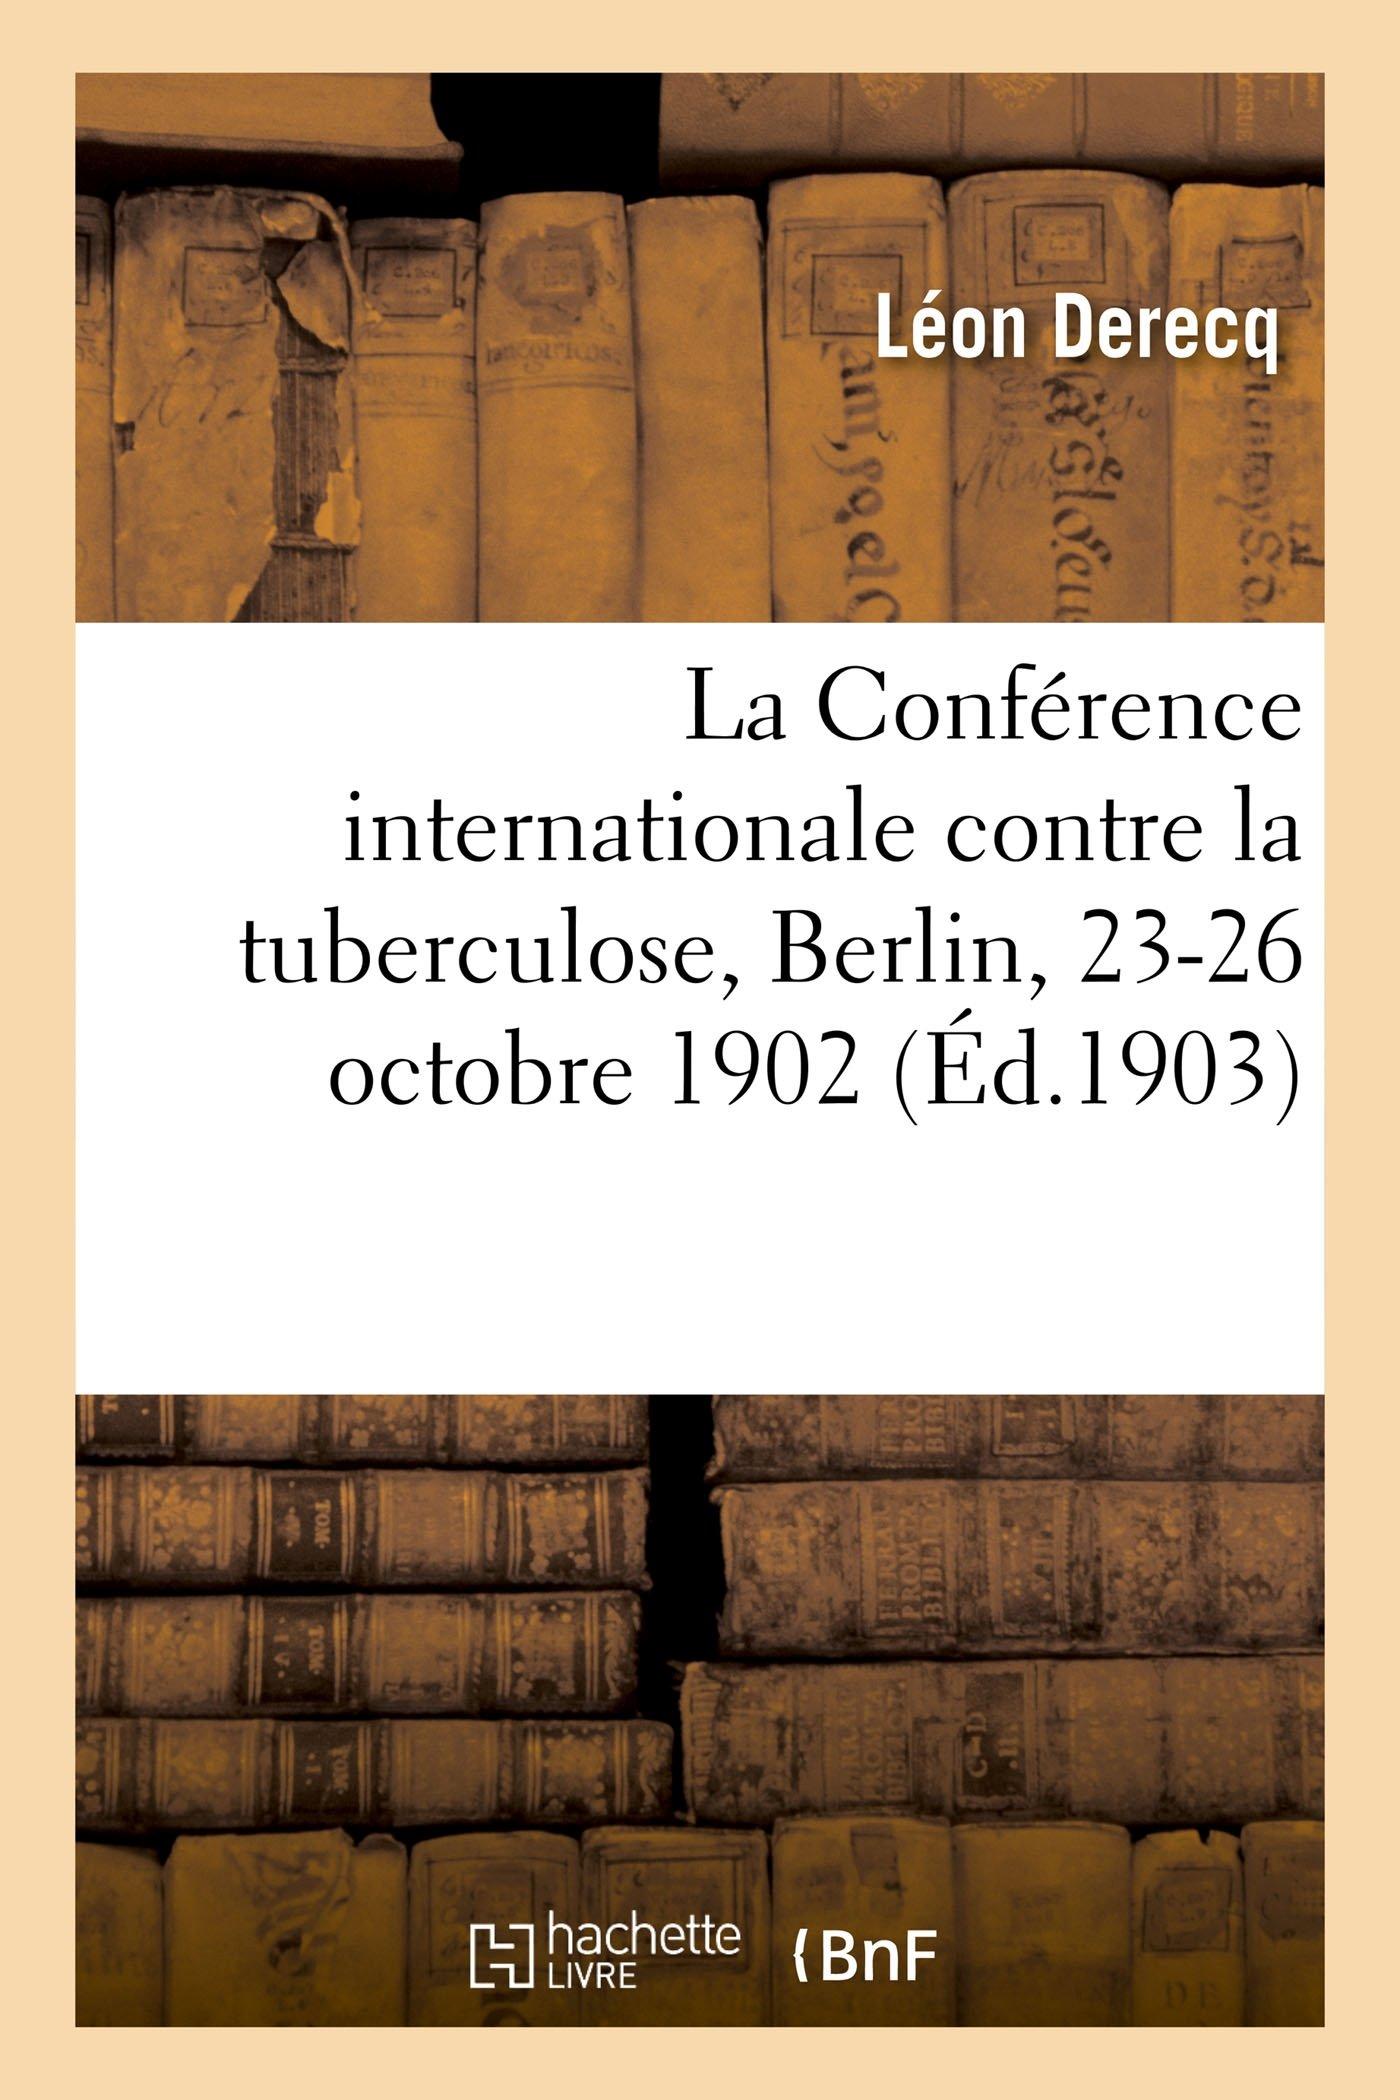 Download La Conférence Internationale Contre La Tuberculose, Berlin, 23-26 Octobre 1902 (Sciences) (French Edition) PDF Text fb2 book